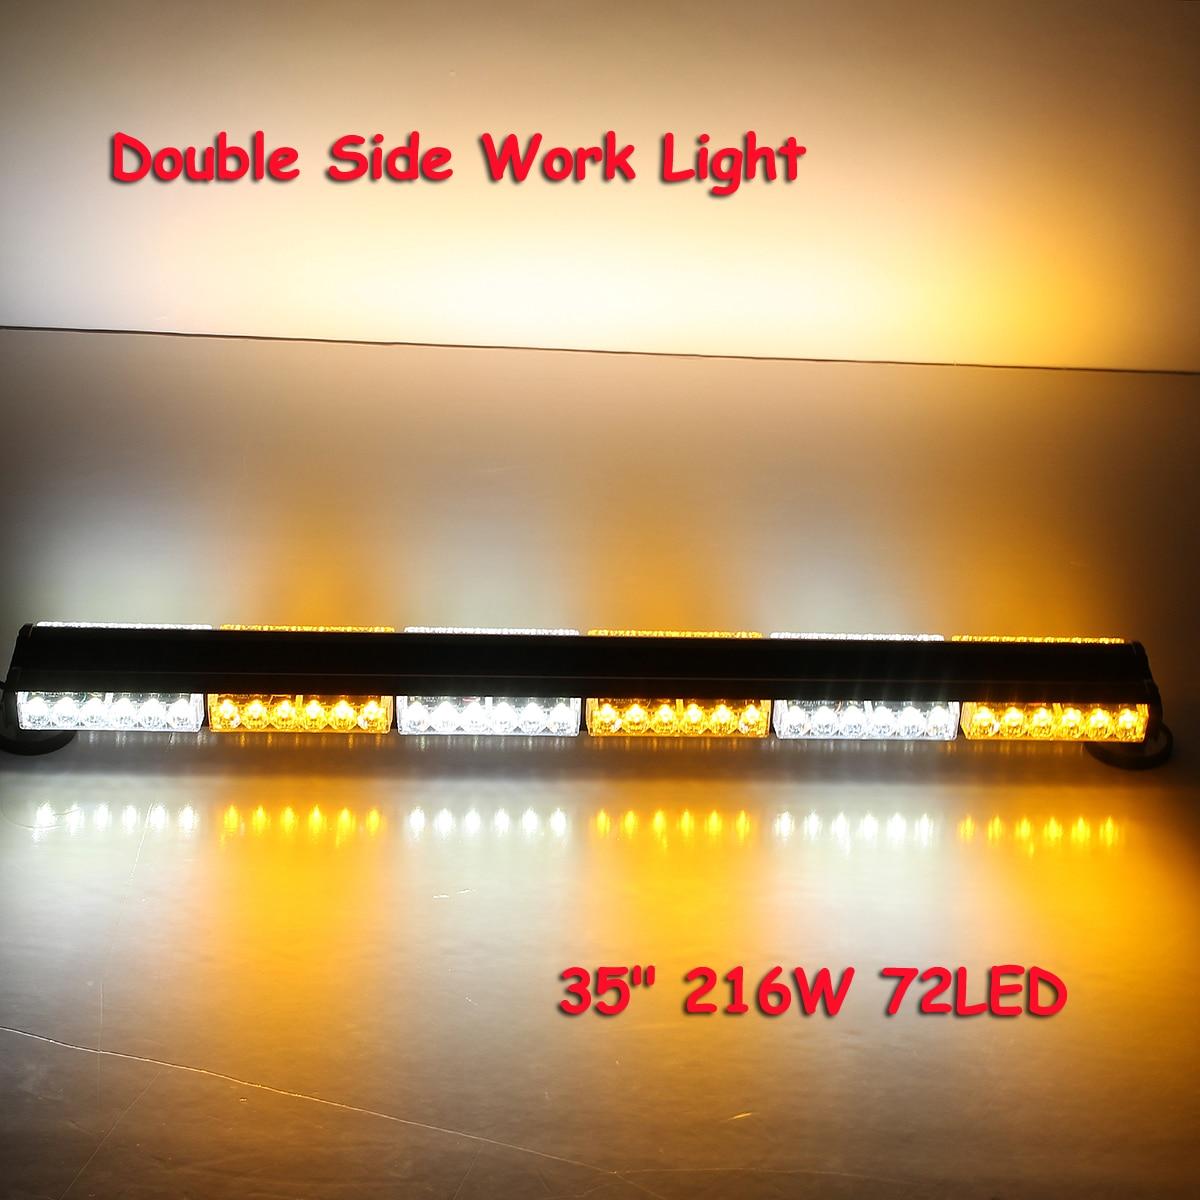 35 216W 72LED Style Double Side Work Light Bar Beacon Warn Strobe Lights Amber White Strobe Emergency Light Profession